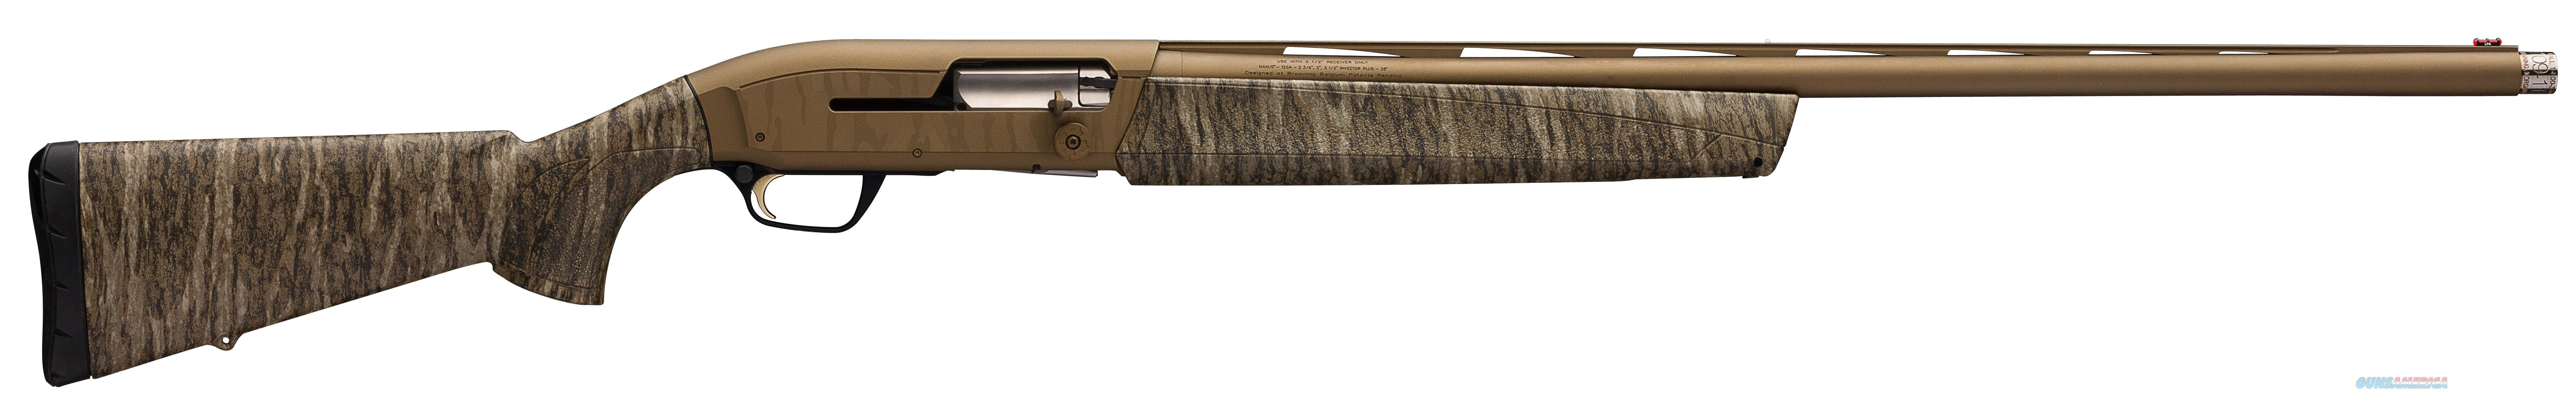 Maxus Wicked Wing MOBL 12Ga 28-3.5In 011672204  Guns > Shotguns > Browning Shotguns > Autoloaders > Hunting